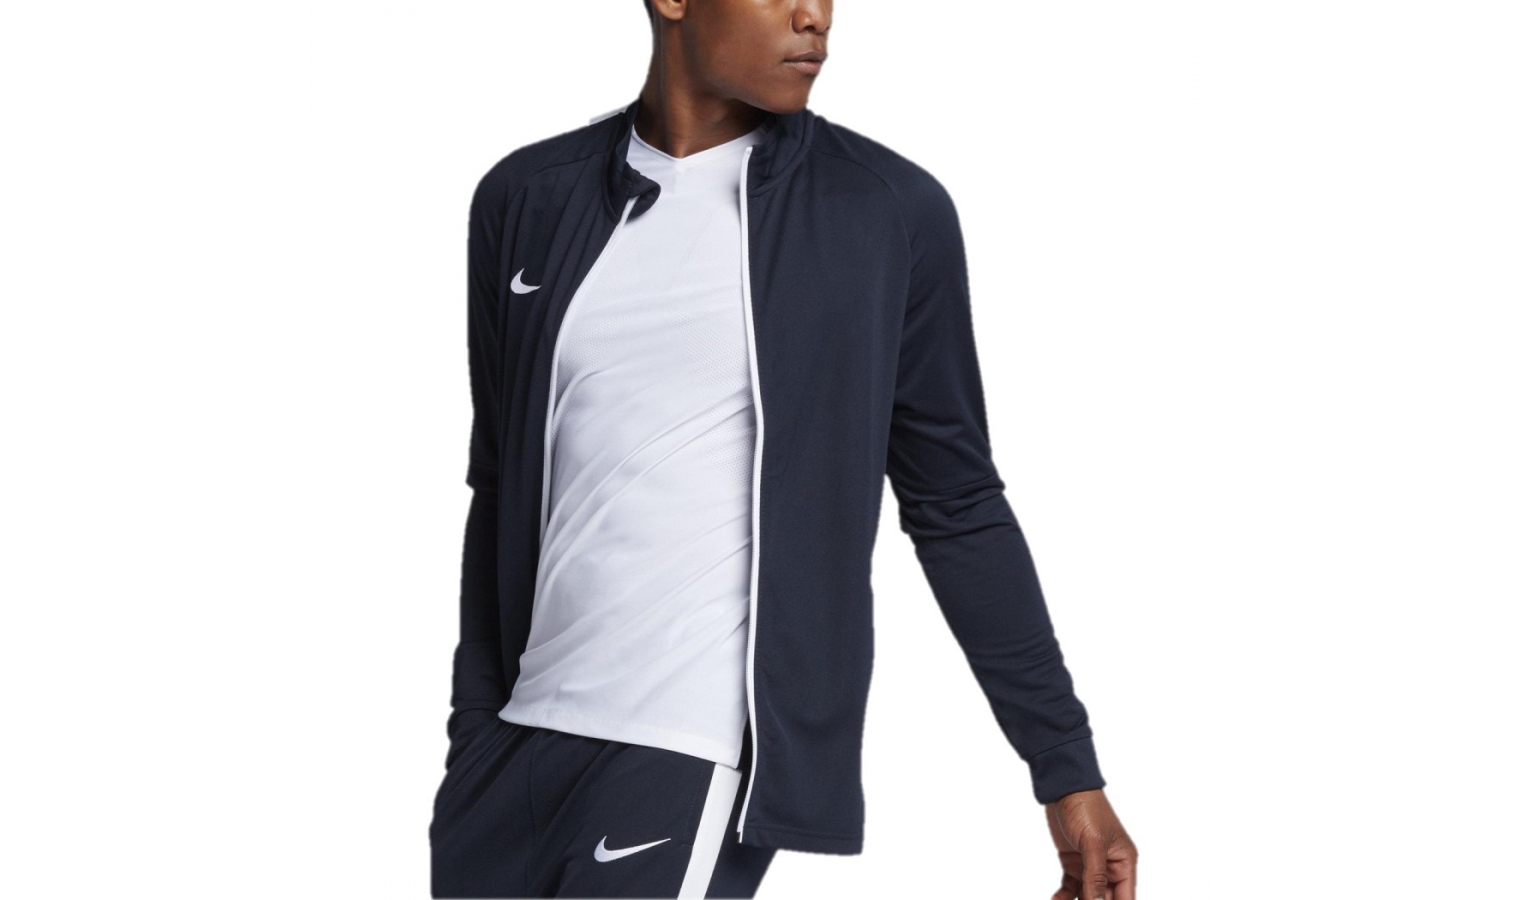 Pánska športová súprava Nike DRY ACADEMY TRK SUIT modrá  9dbfc906b7d